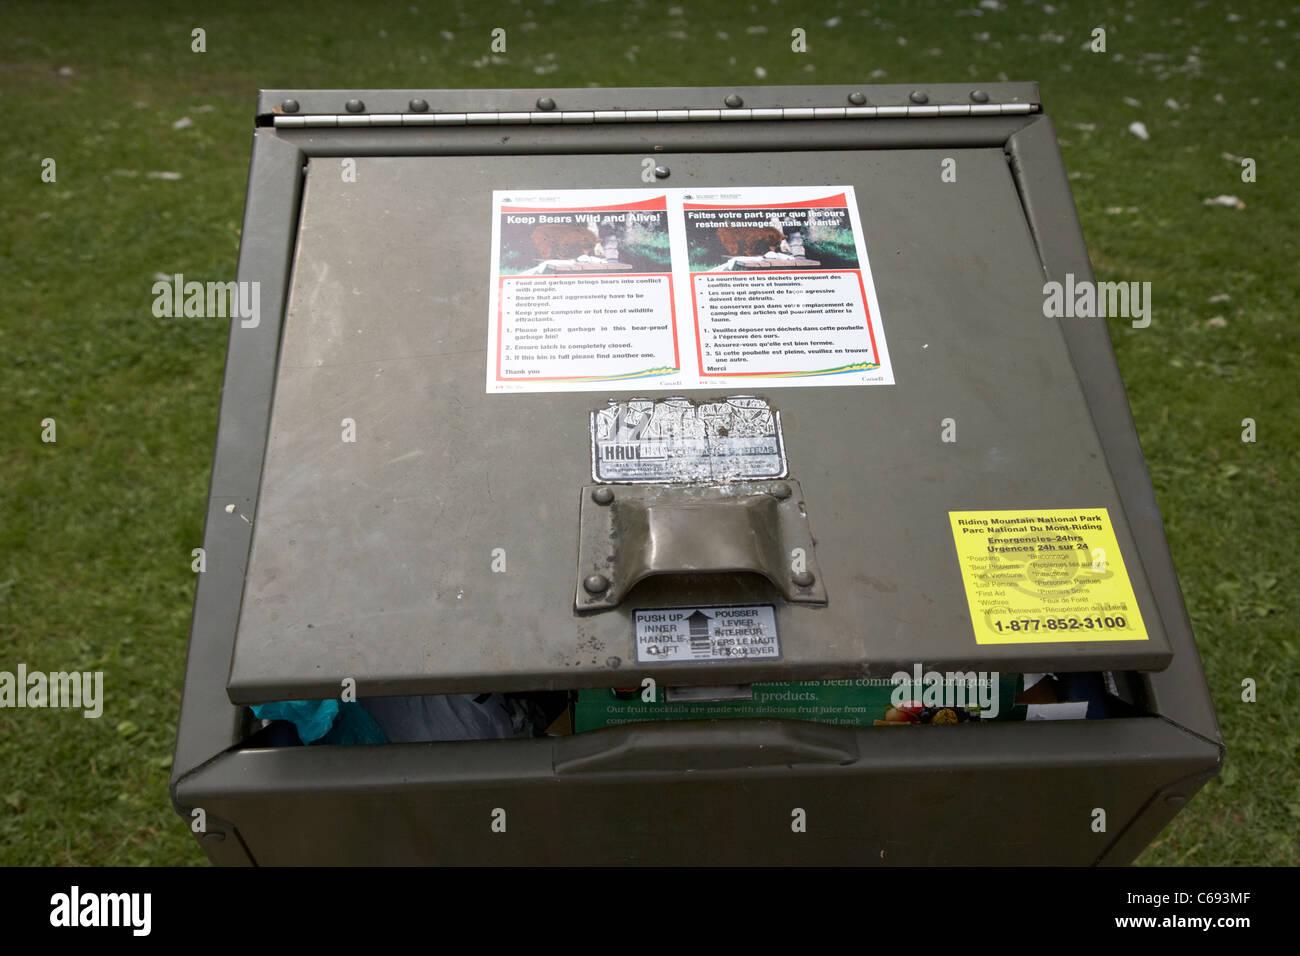 bear proof litter bin left open riding mountain national park Manitoba Canada - Stock Image